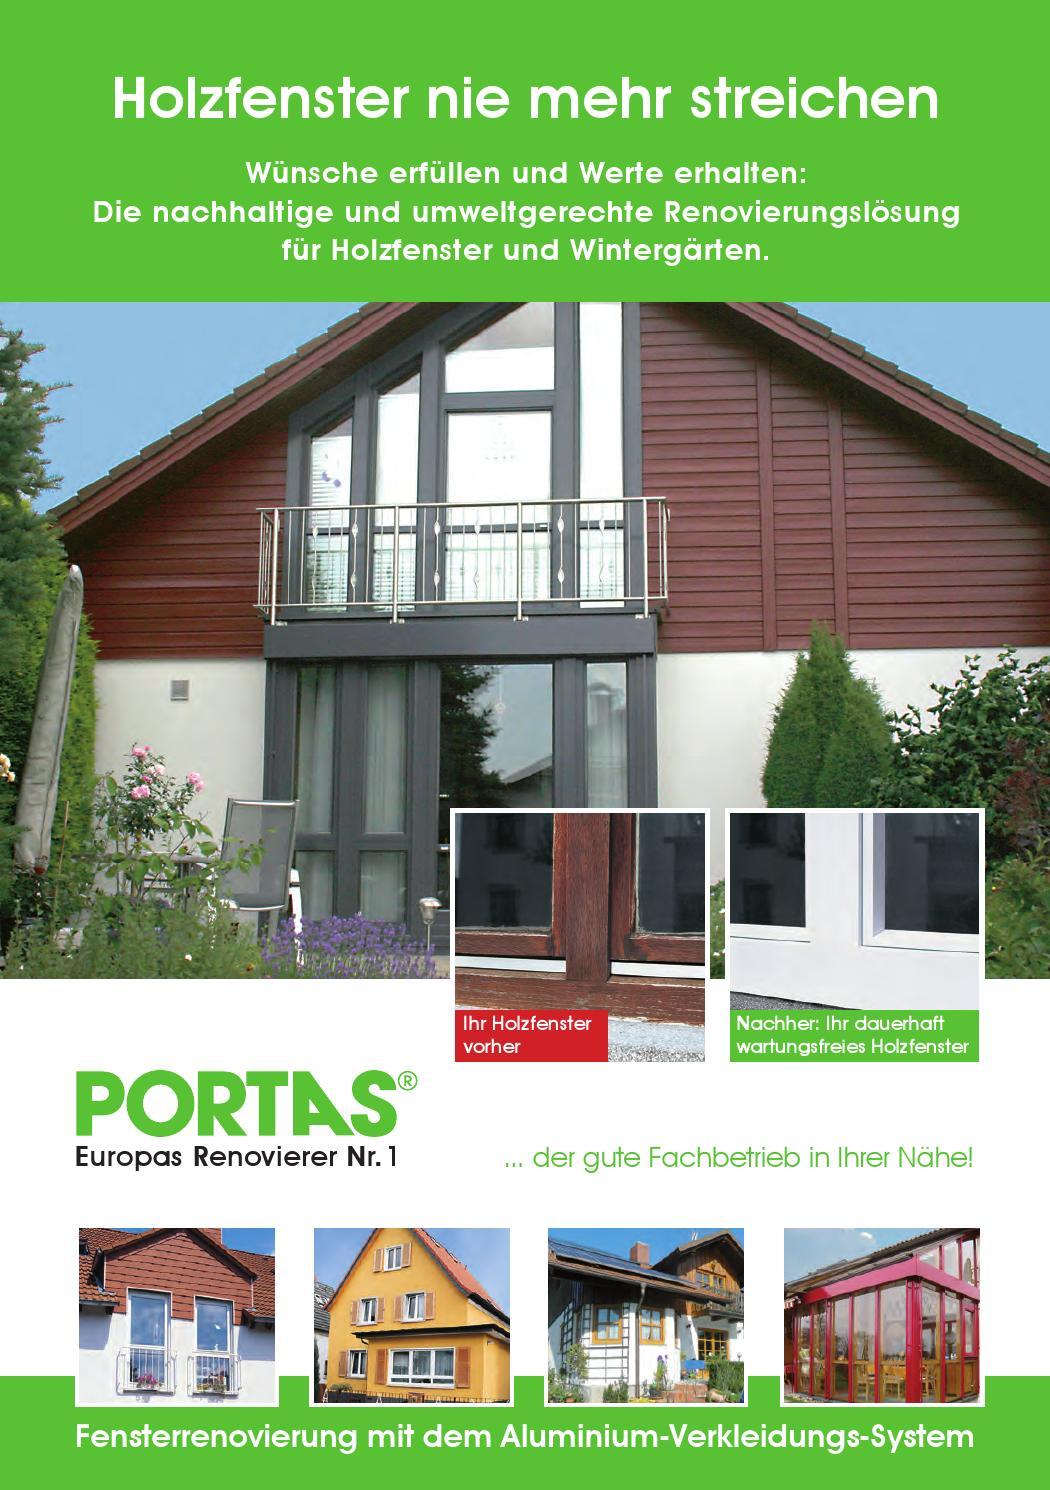 Portas Fenster Renovierungs Katalog 12 2015 By Portas